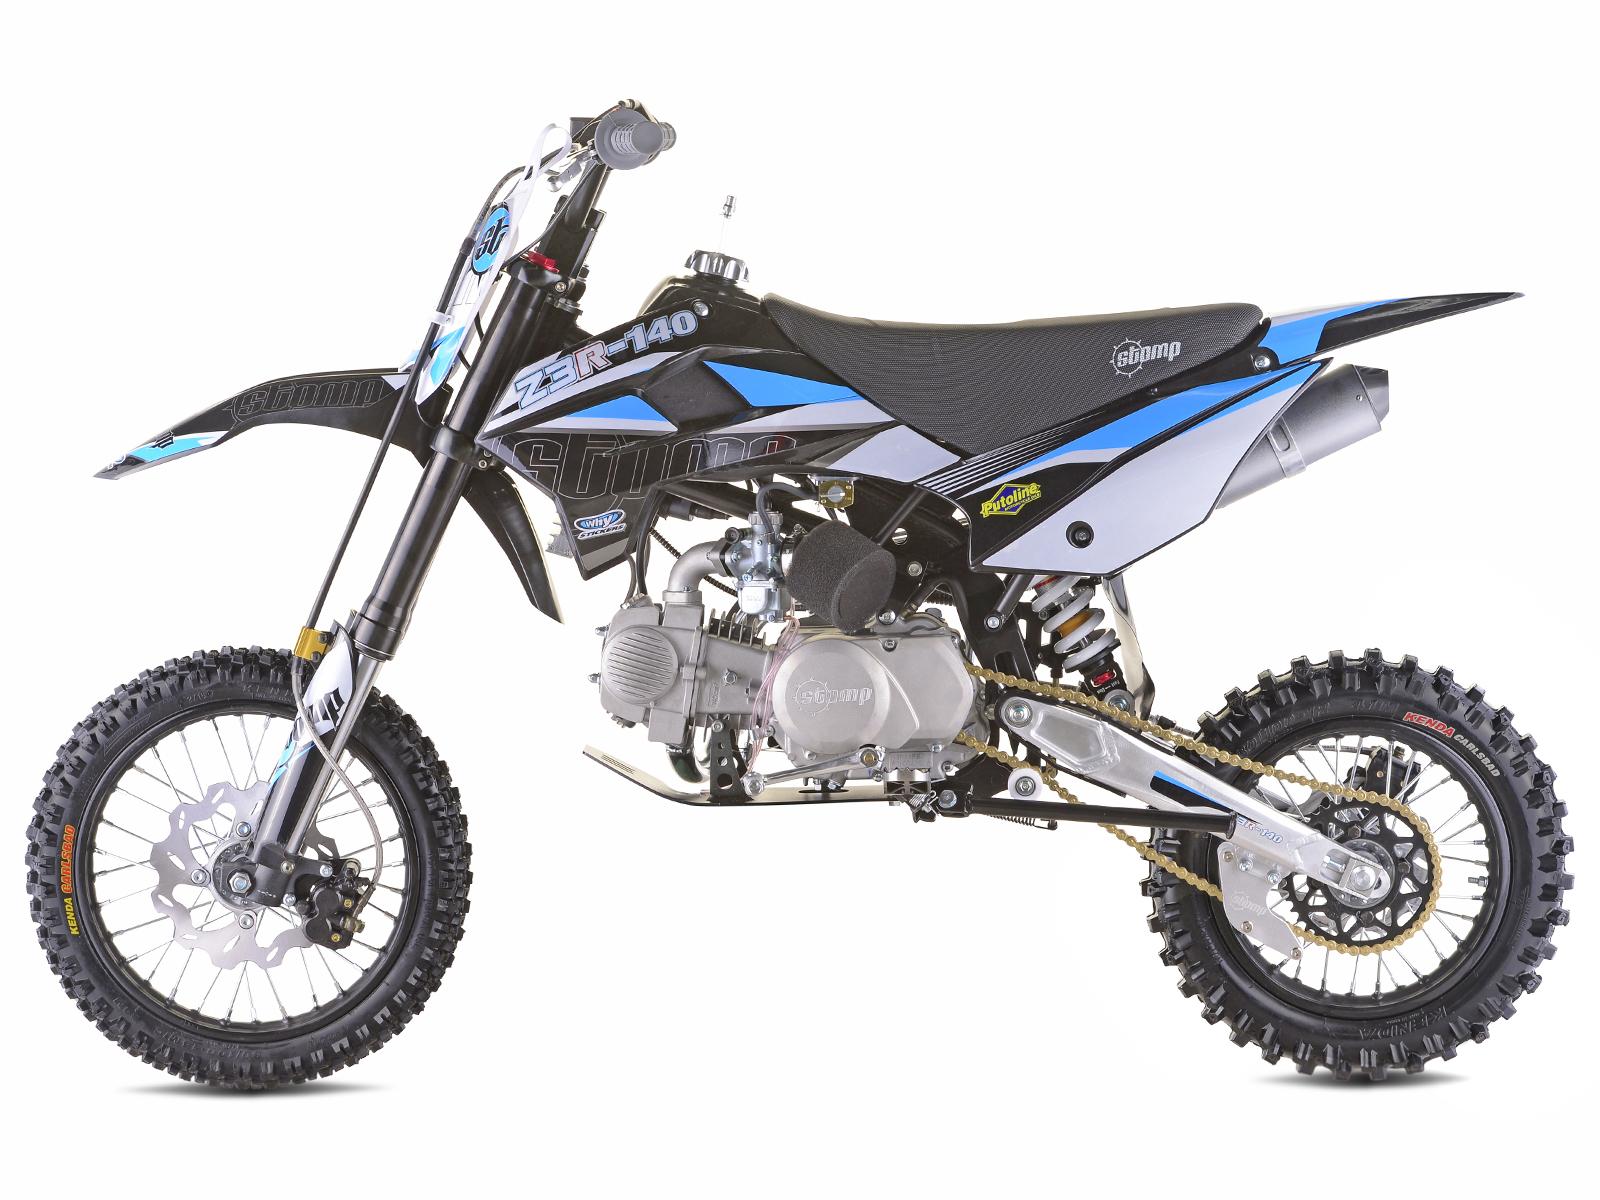 Stomp Z3r 140 Pit Bike Altis Ind Ltd